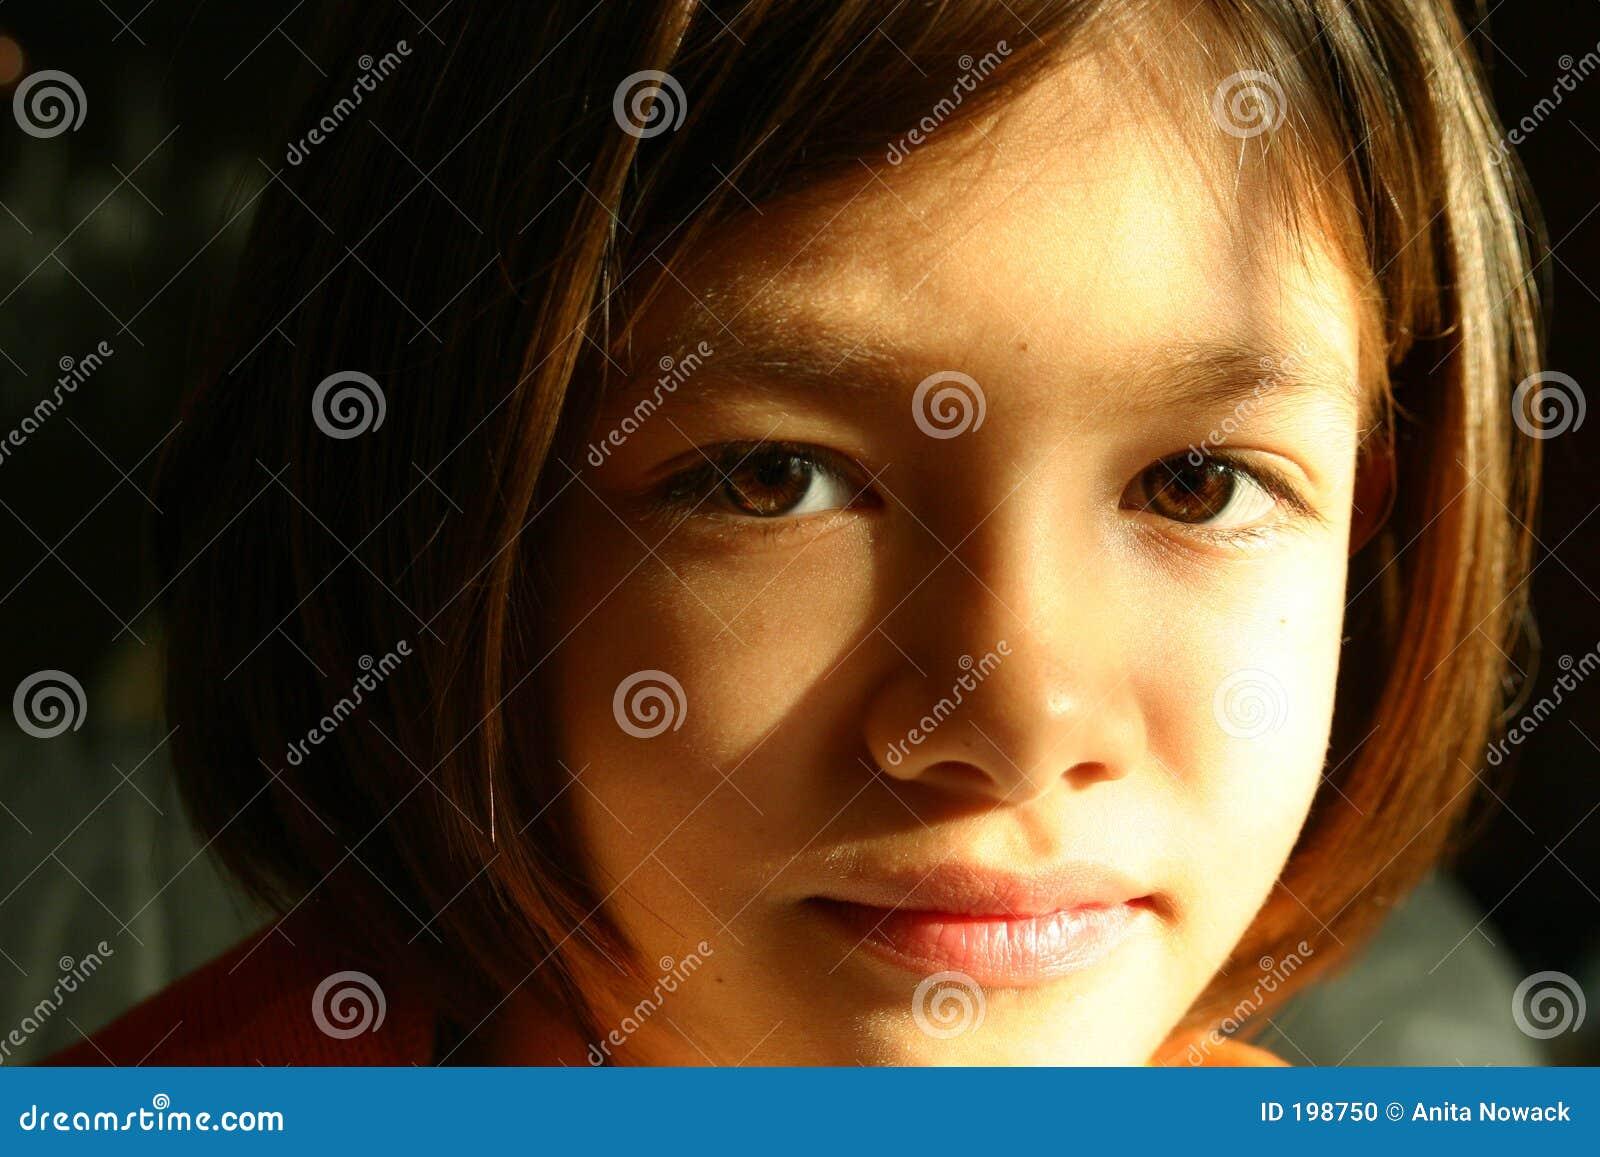 Girl face - expressive eyes